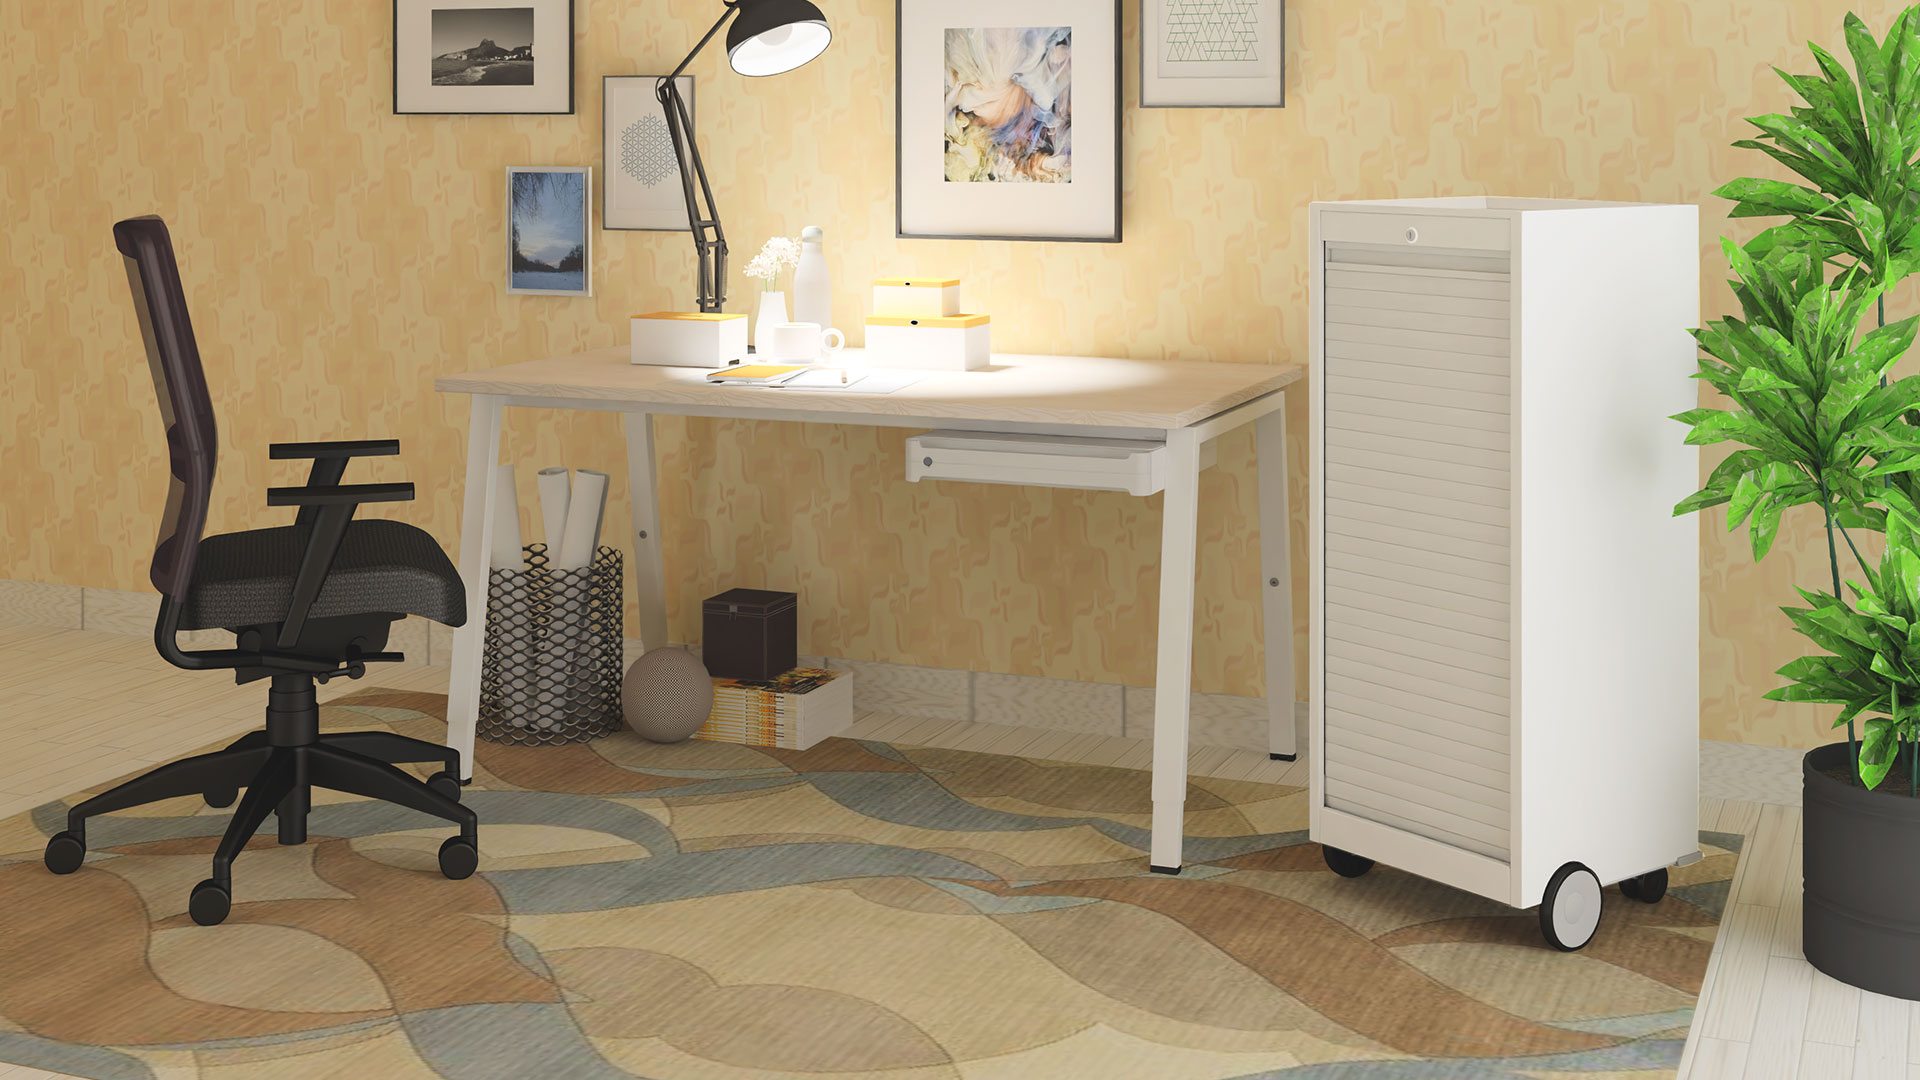 Schreibtisch-Home-Office-Arbeitsplatz-arcos-a-mauser-16-9